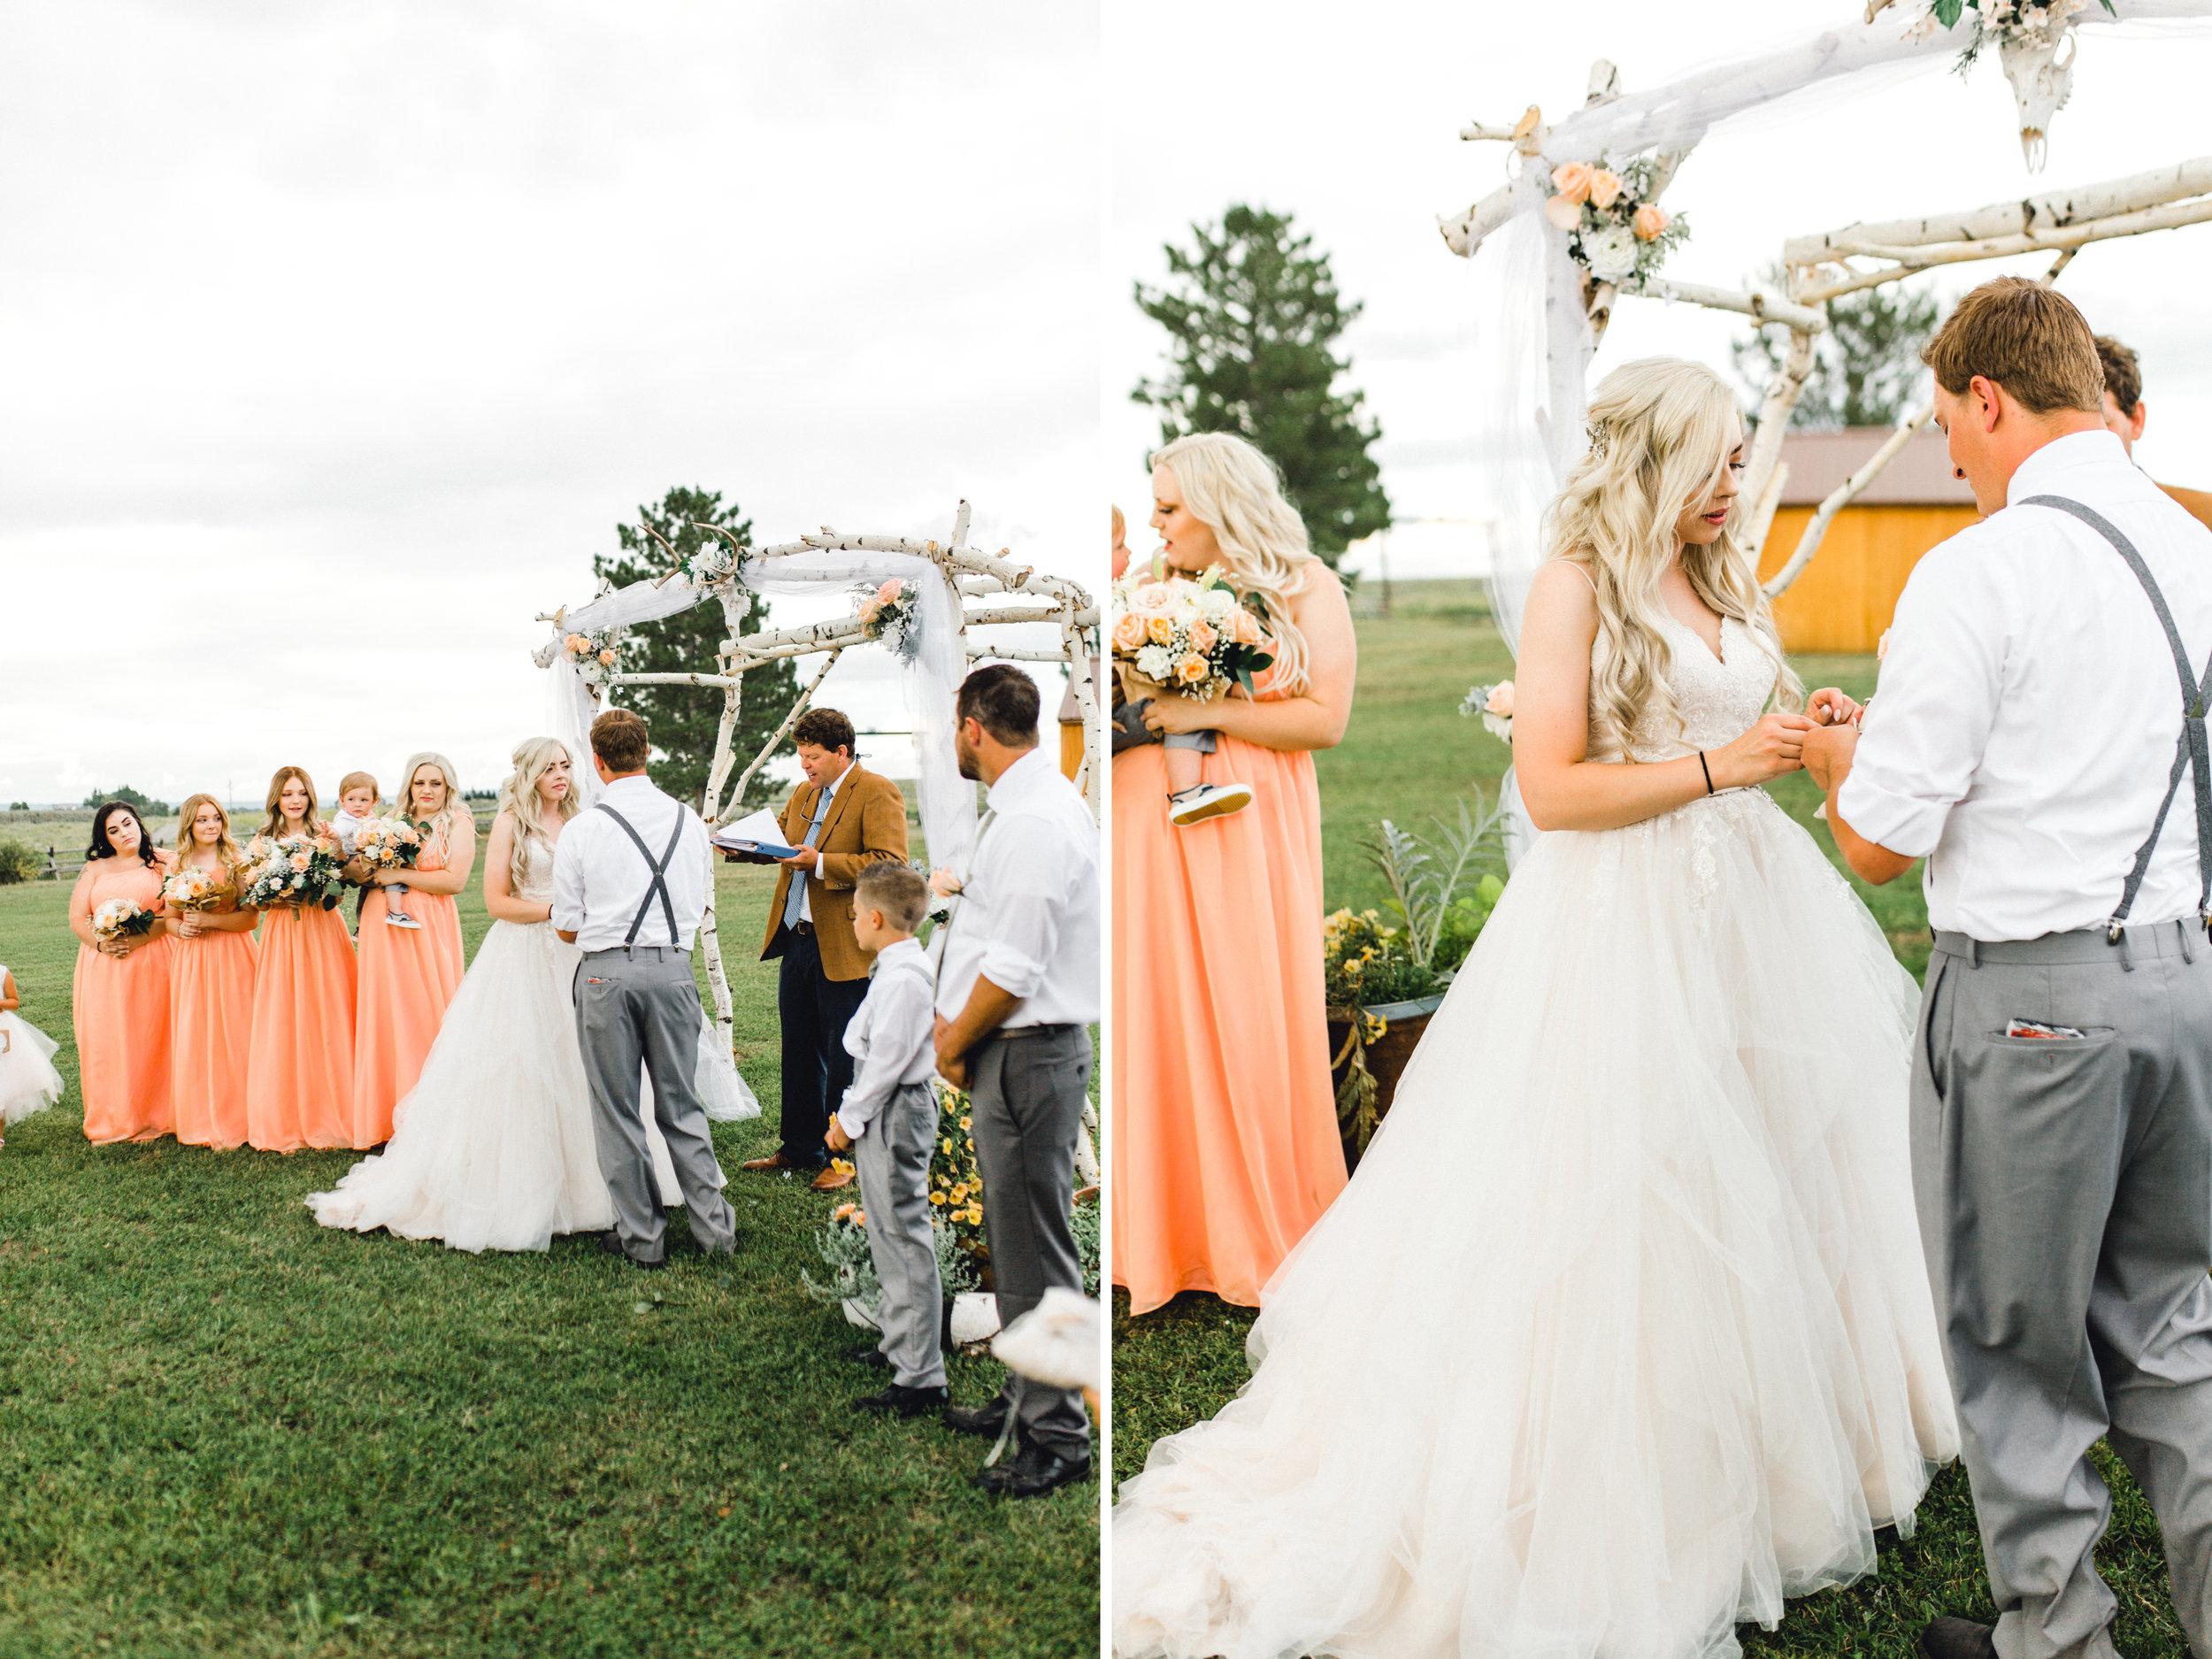 country-outdoor-rustic-wedding-tetons-idaho-anna-christine-photo-20.jpg